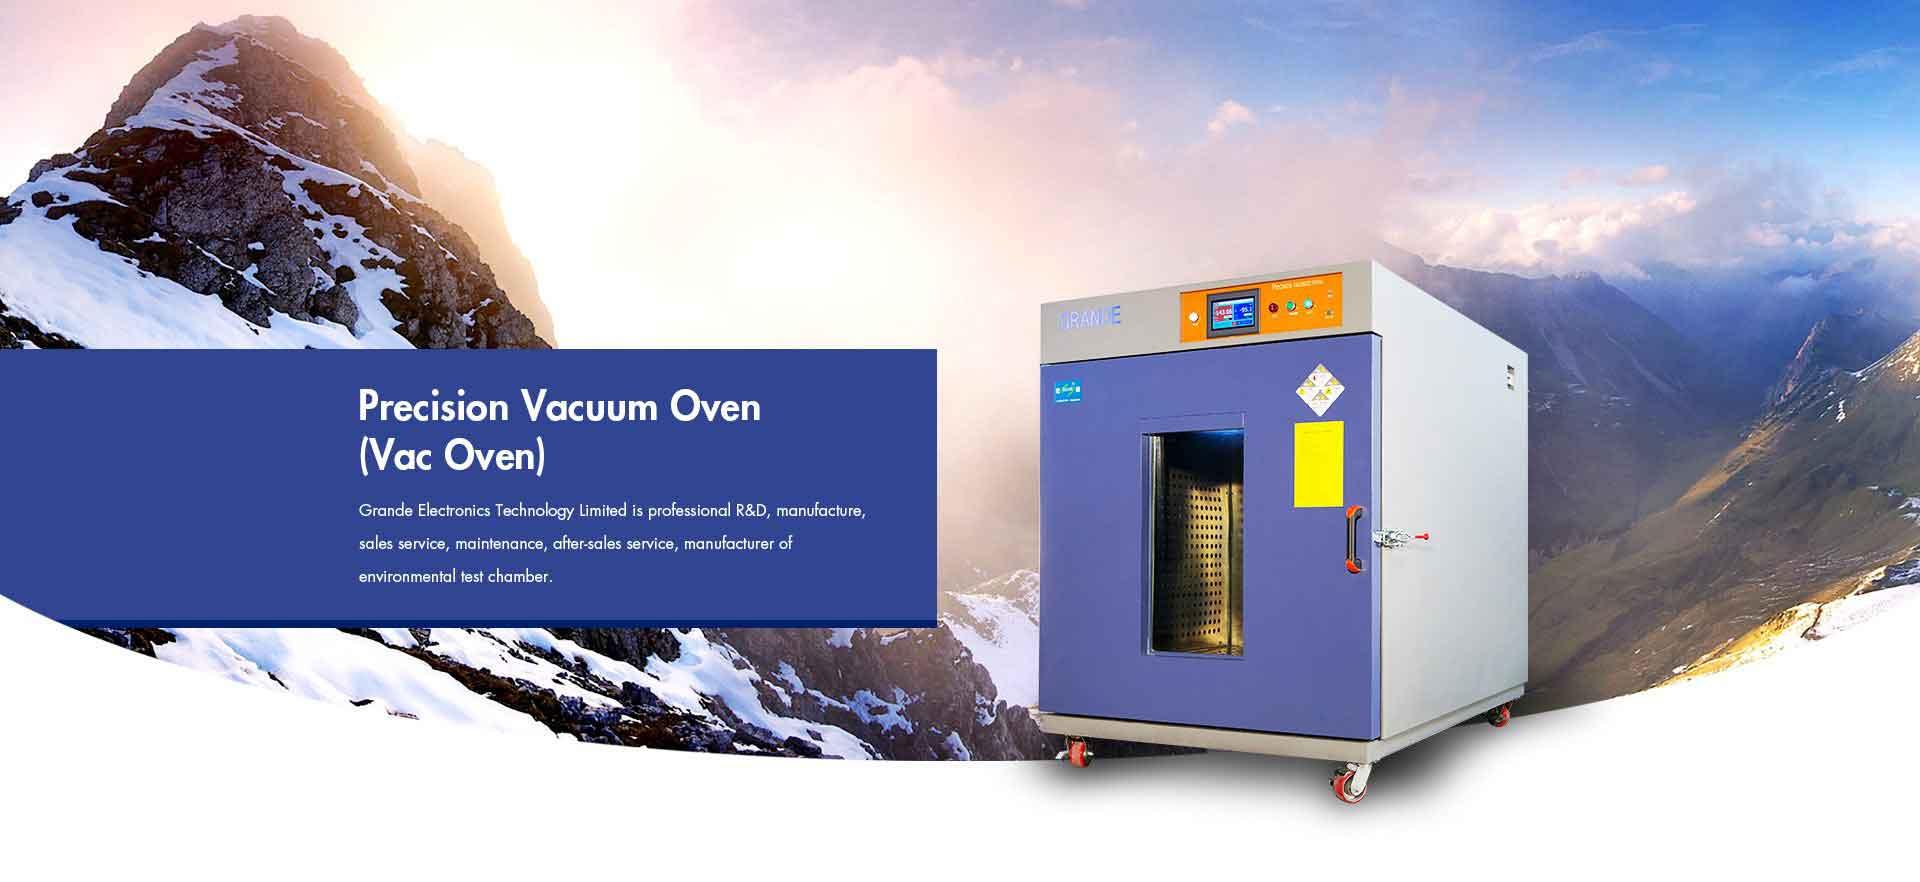 Precision Hot Air Oven